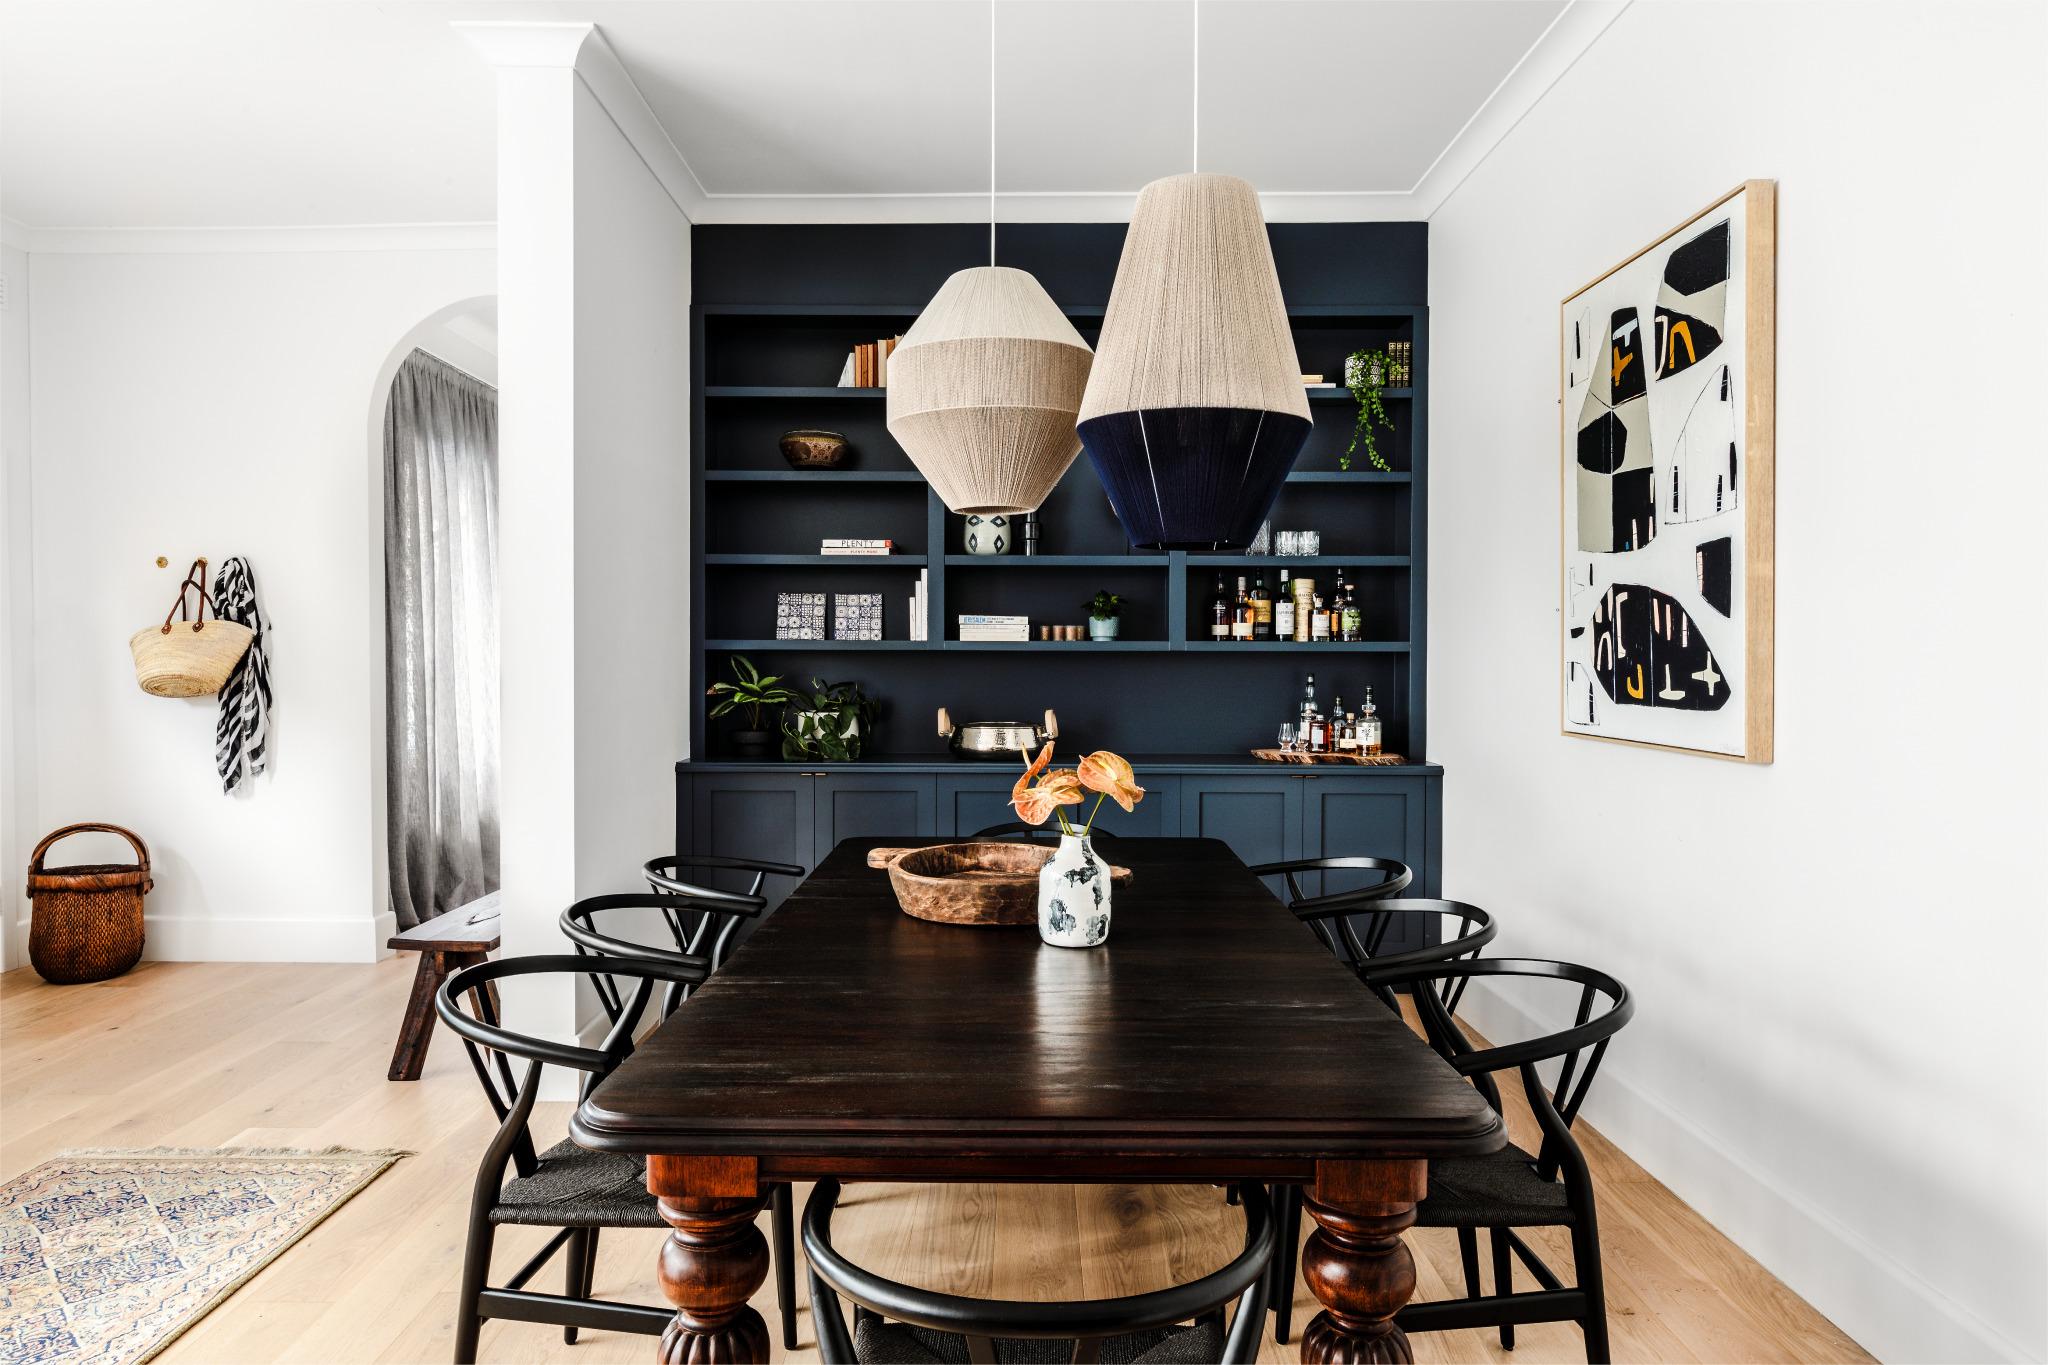 Gallery Of Malvern Home By Studio Ezra Local Australian Residential Interiors Melbourne, Vic Image 6